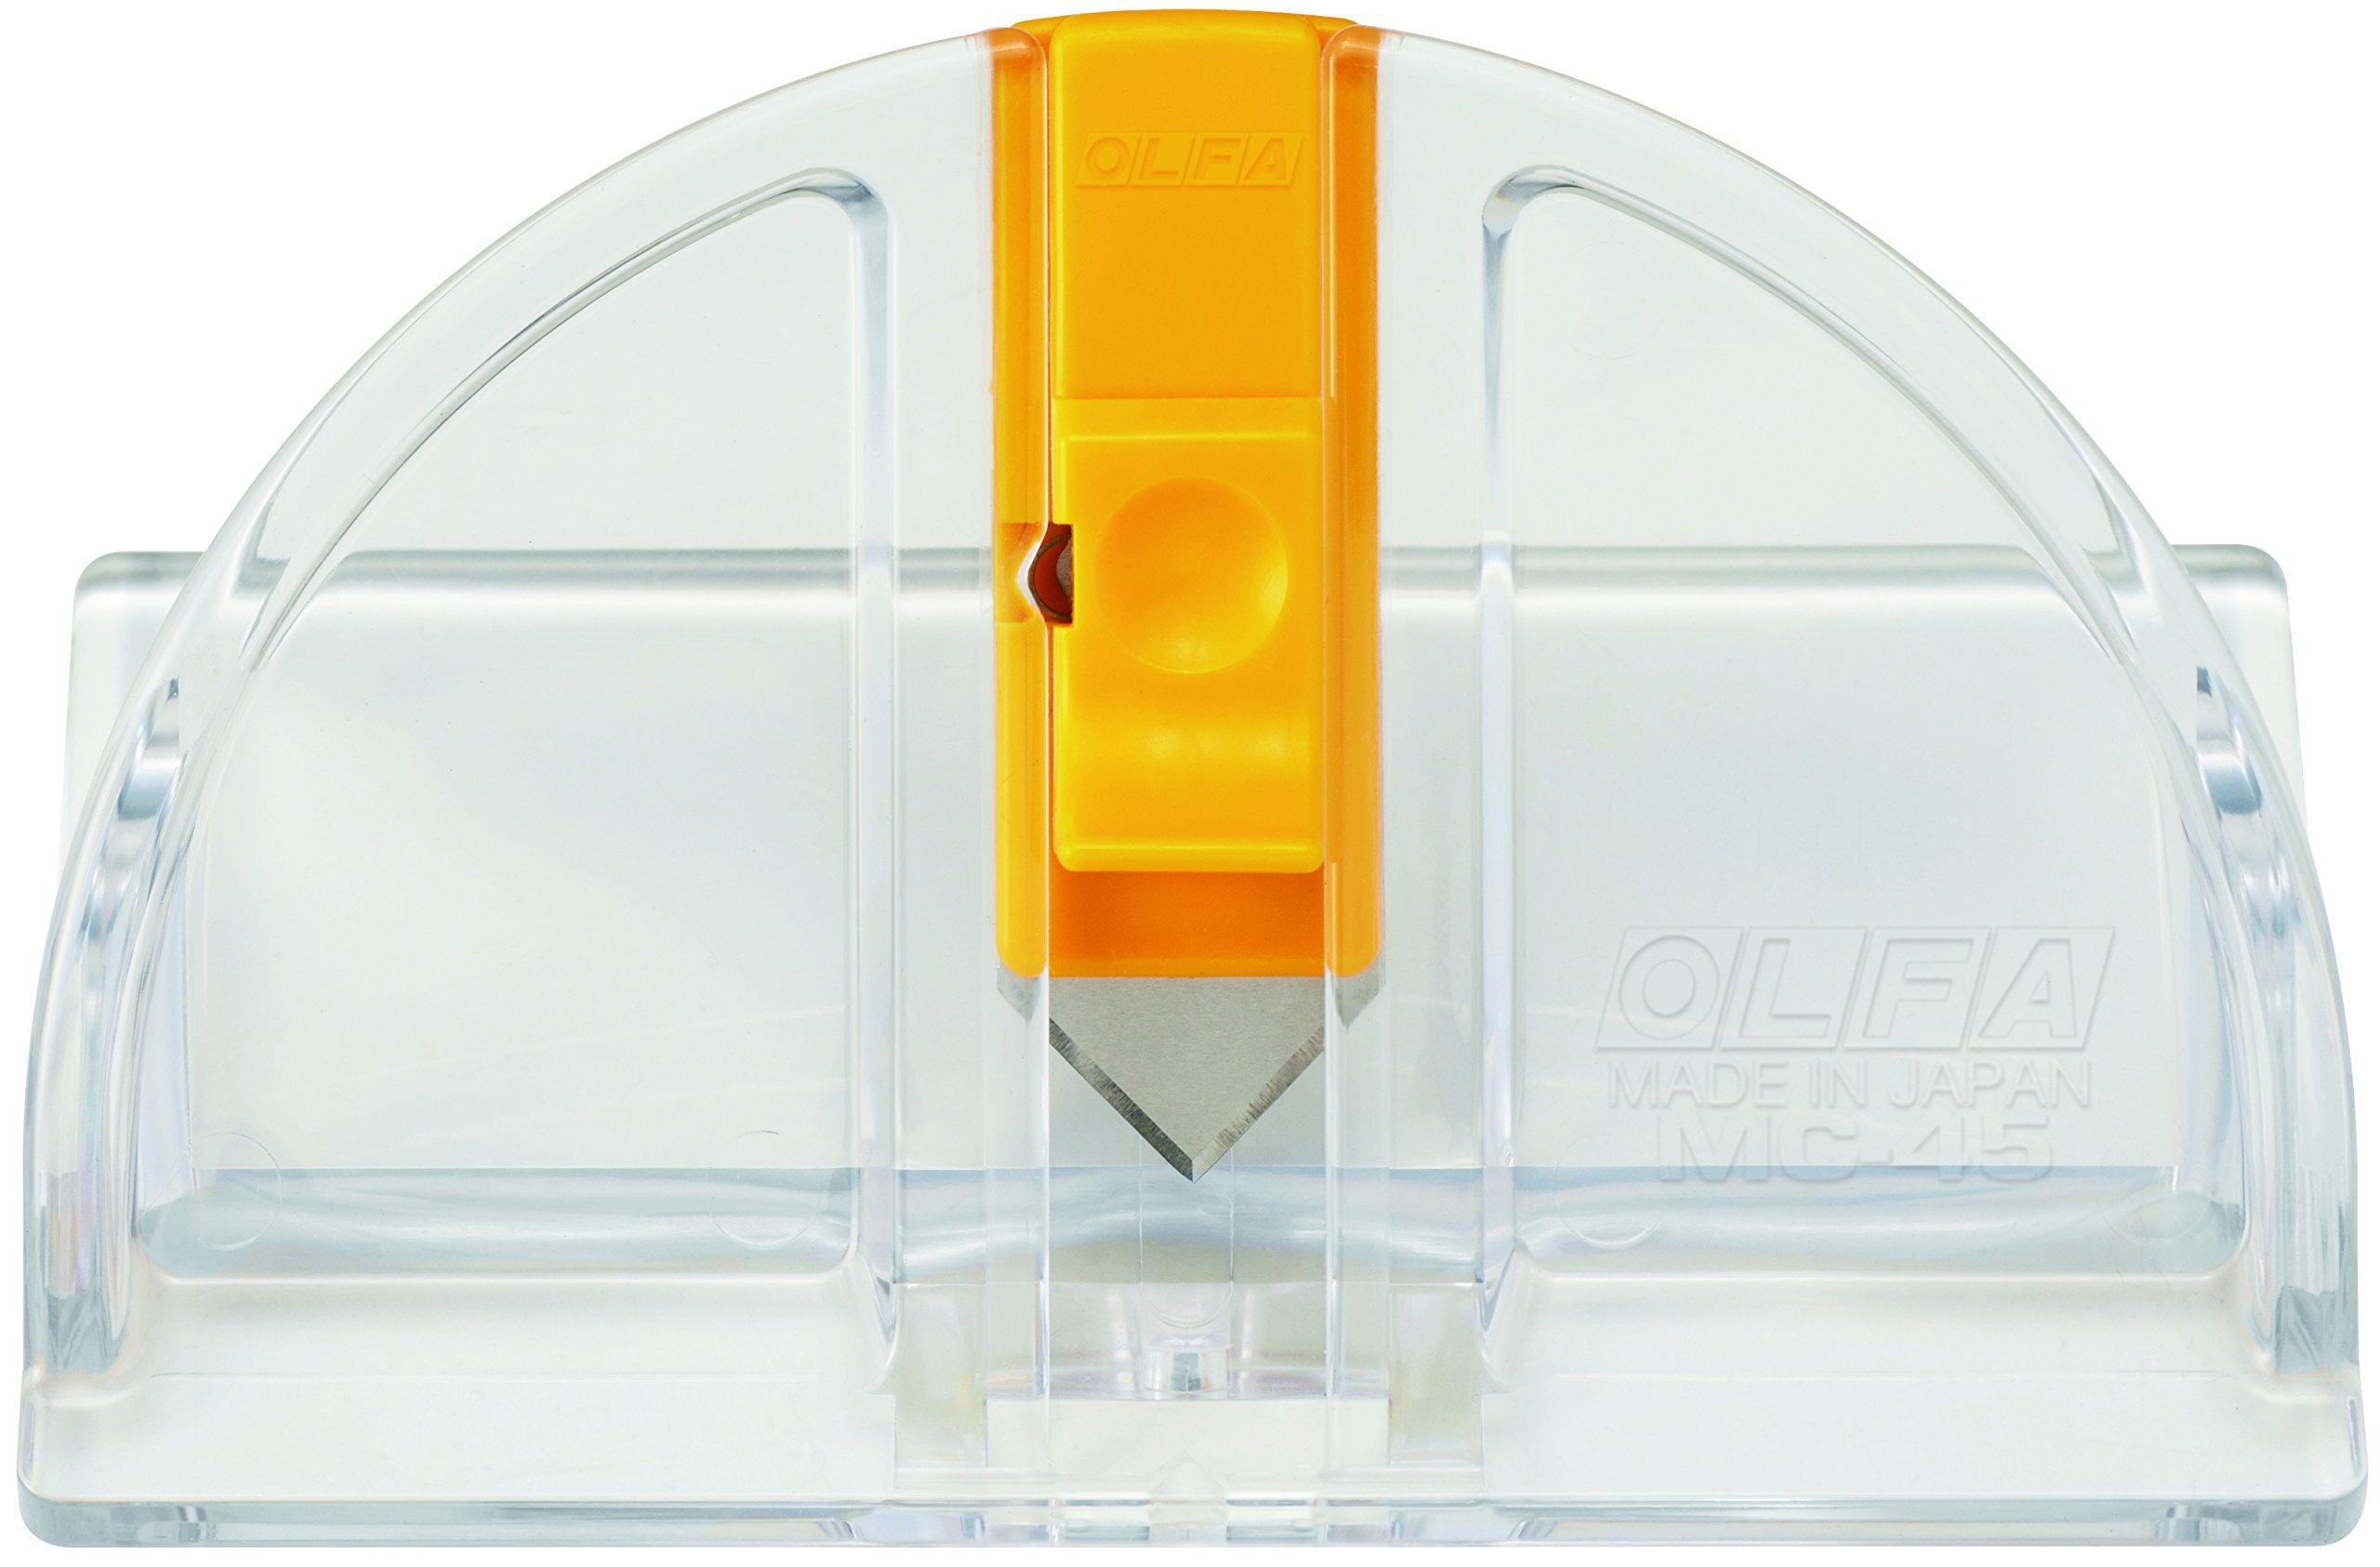 OLFA Mat Cutter With 1 Blade (MC-45/2B)